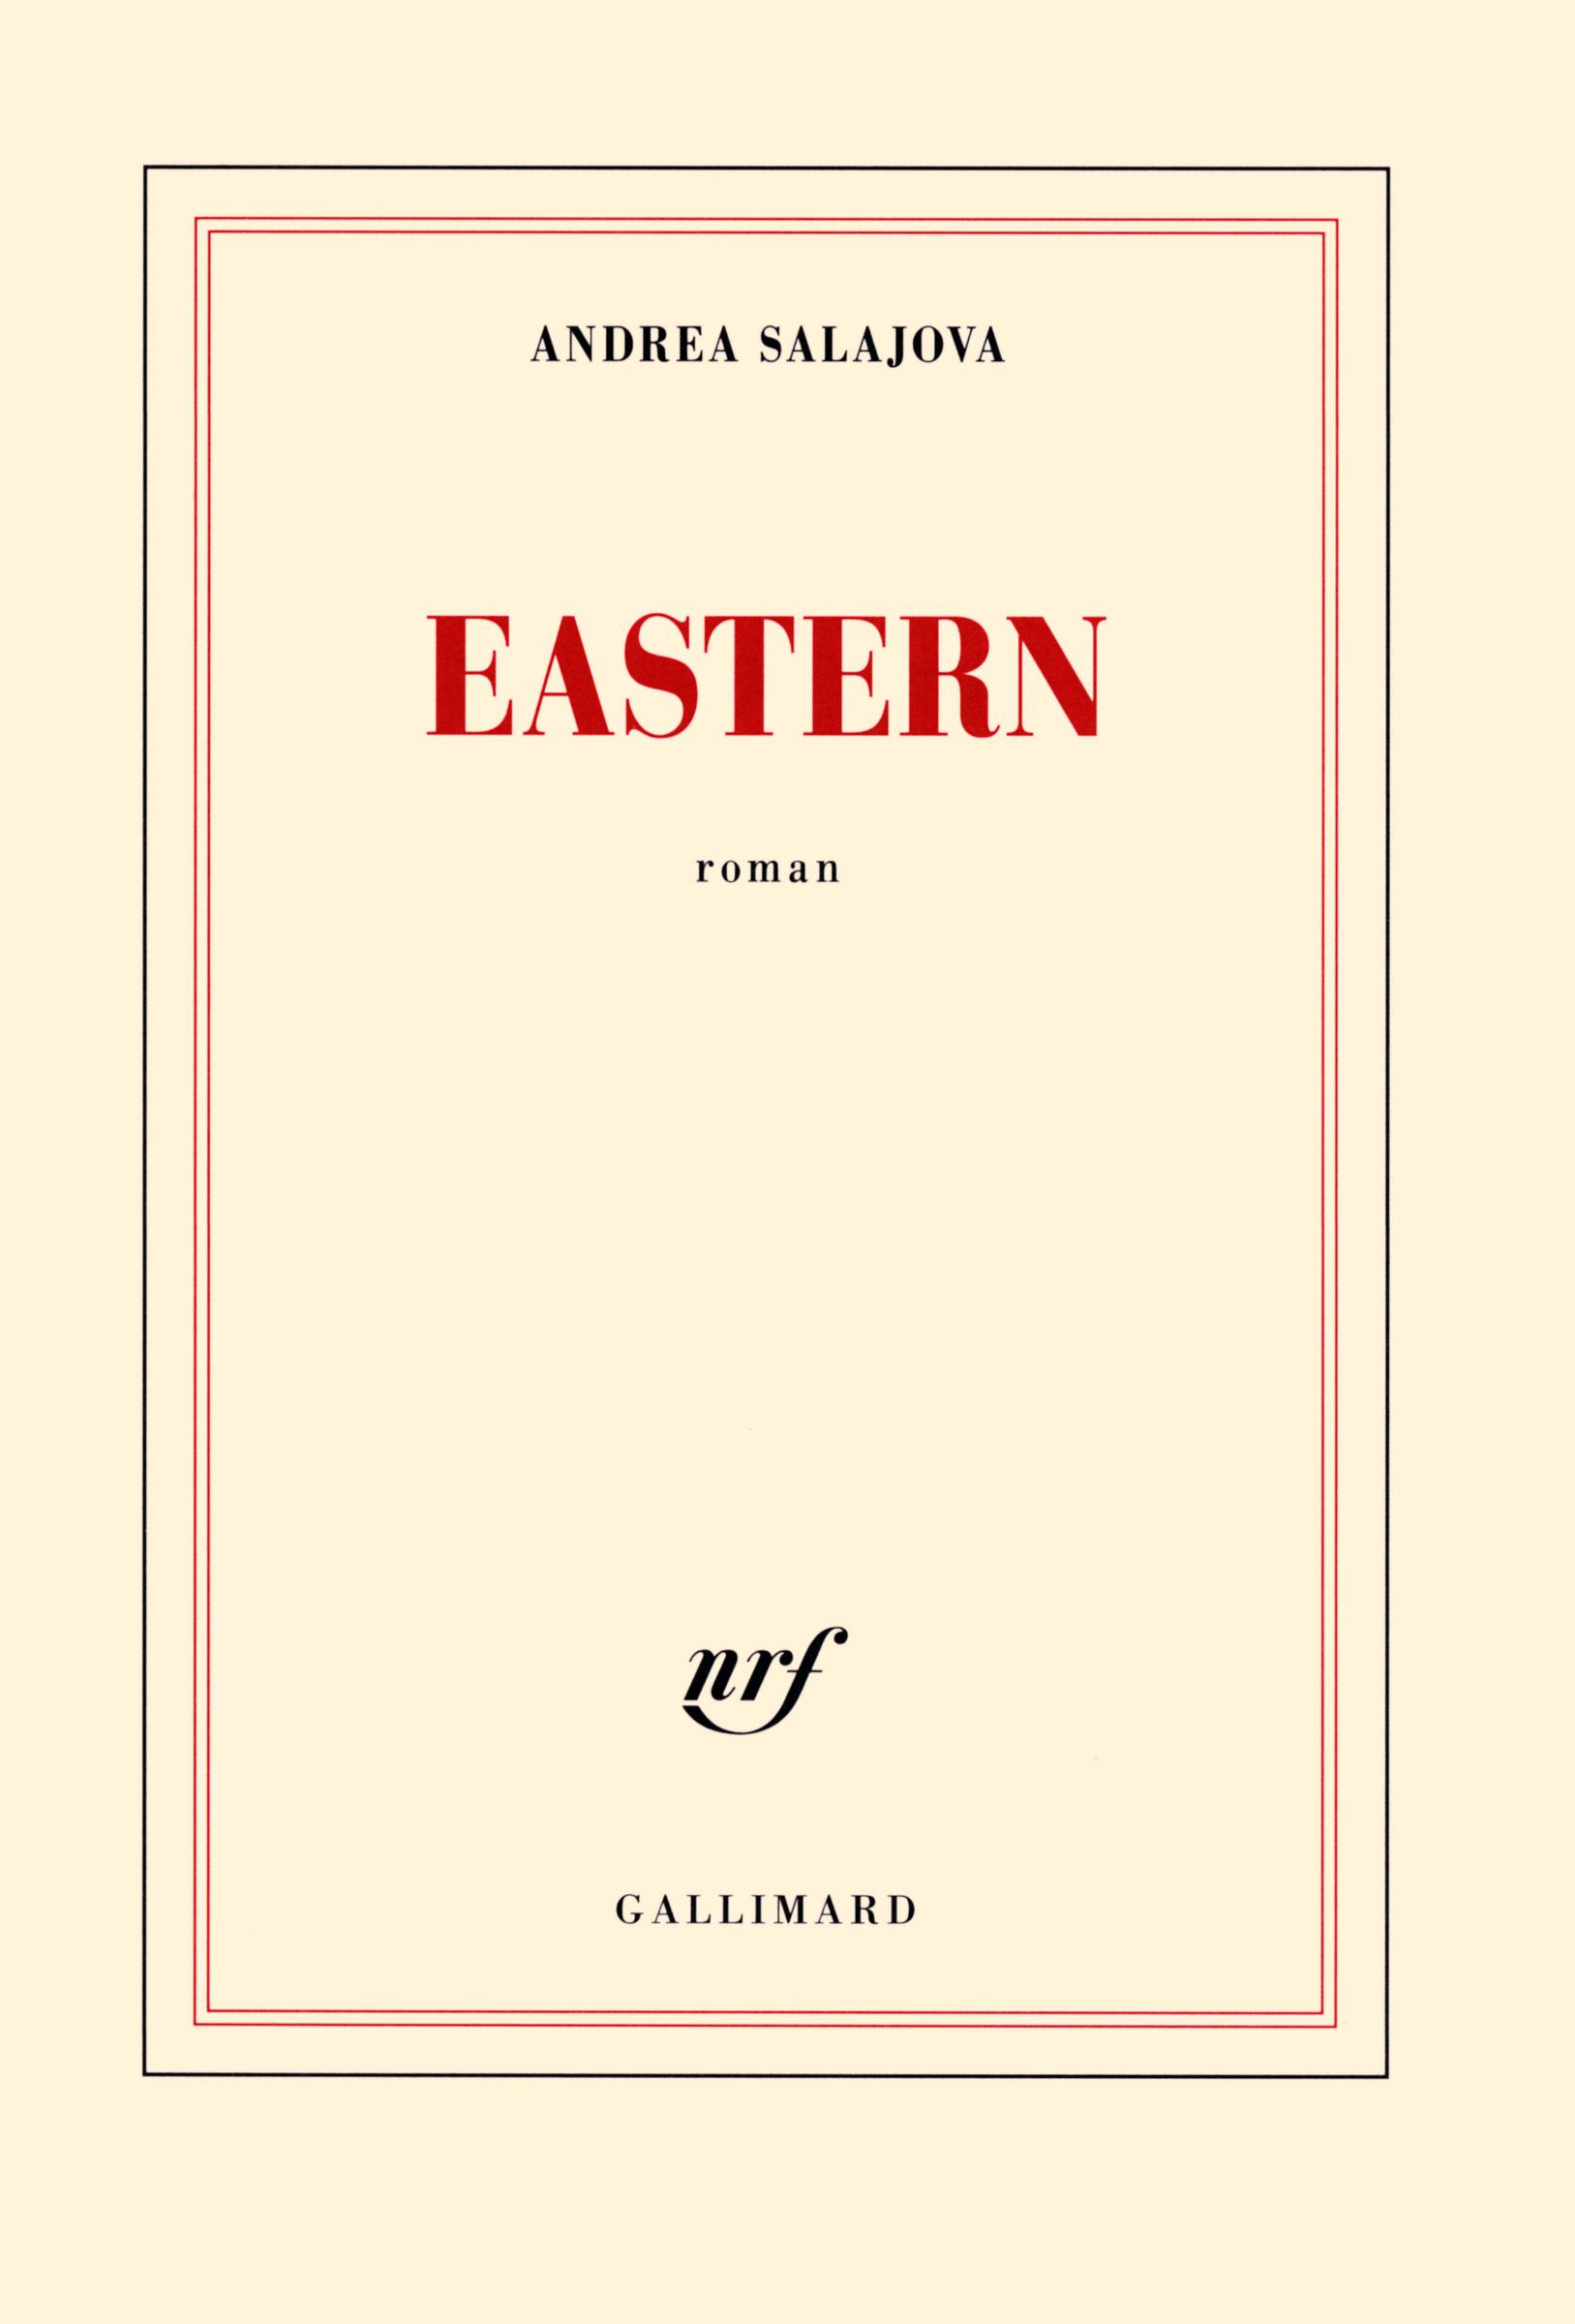 EASTERN ROMAN